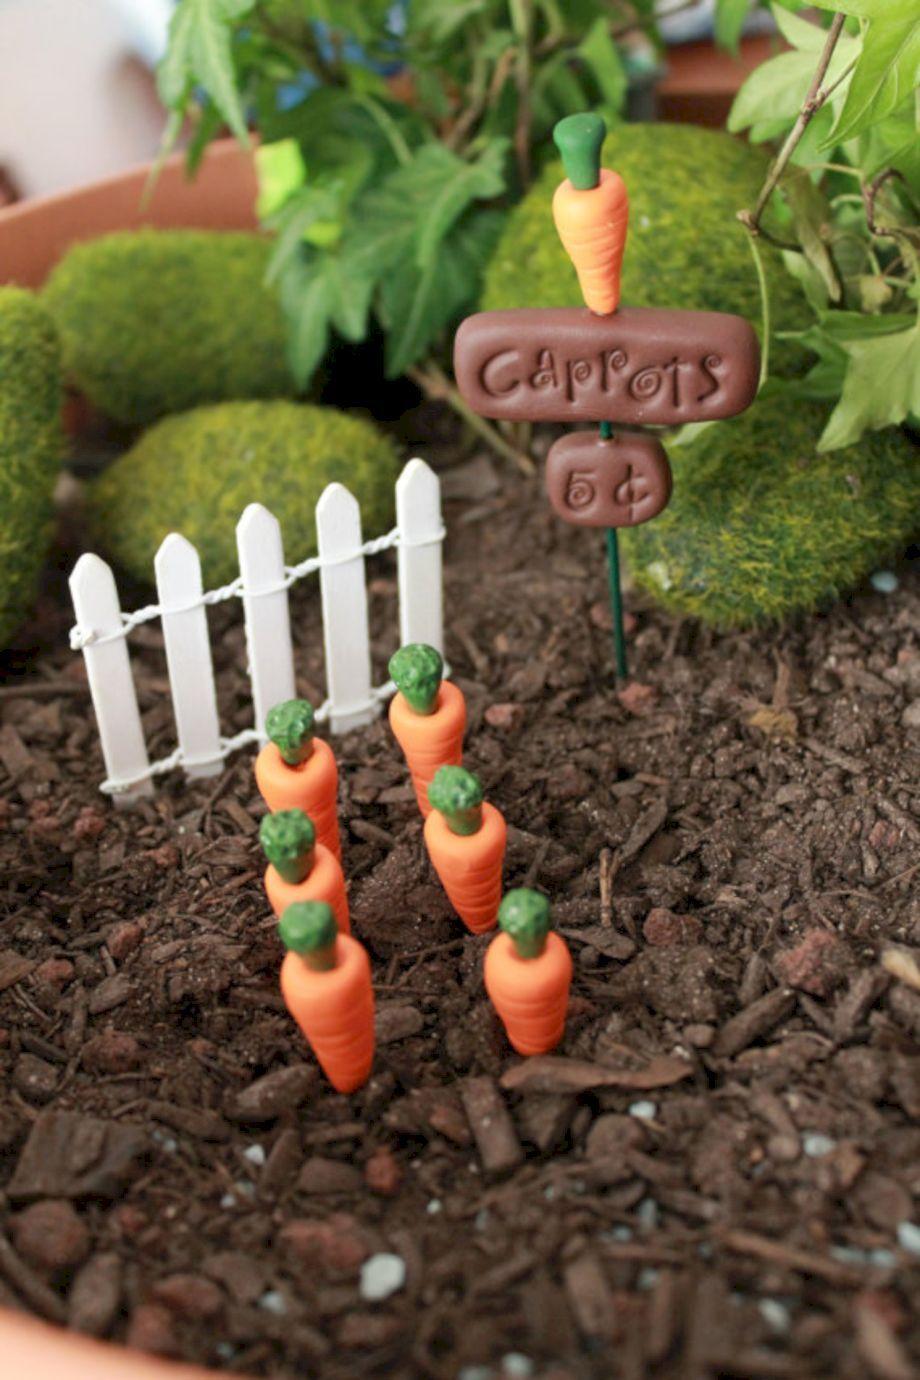 Swanky Inexpensive Fairy Garden Accessories Inexpensive Fairy Garden Accessories Ideas Https Inexpensive Fairy Garden Ideas garden Cheap Fairy Garden Ideas